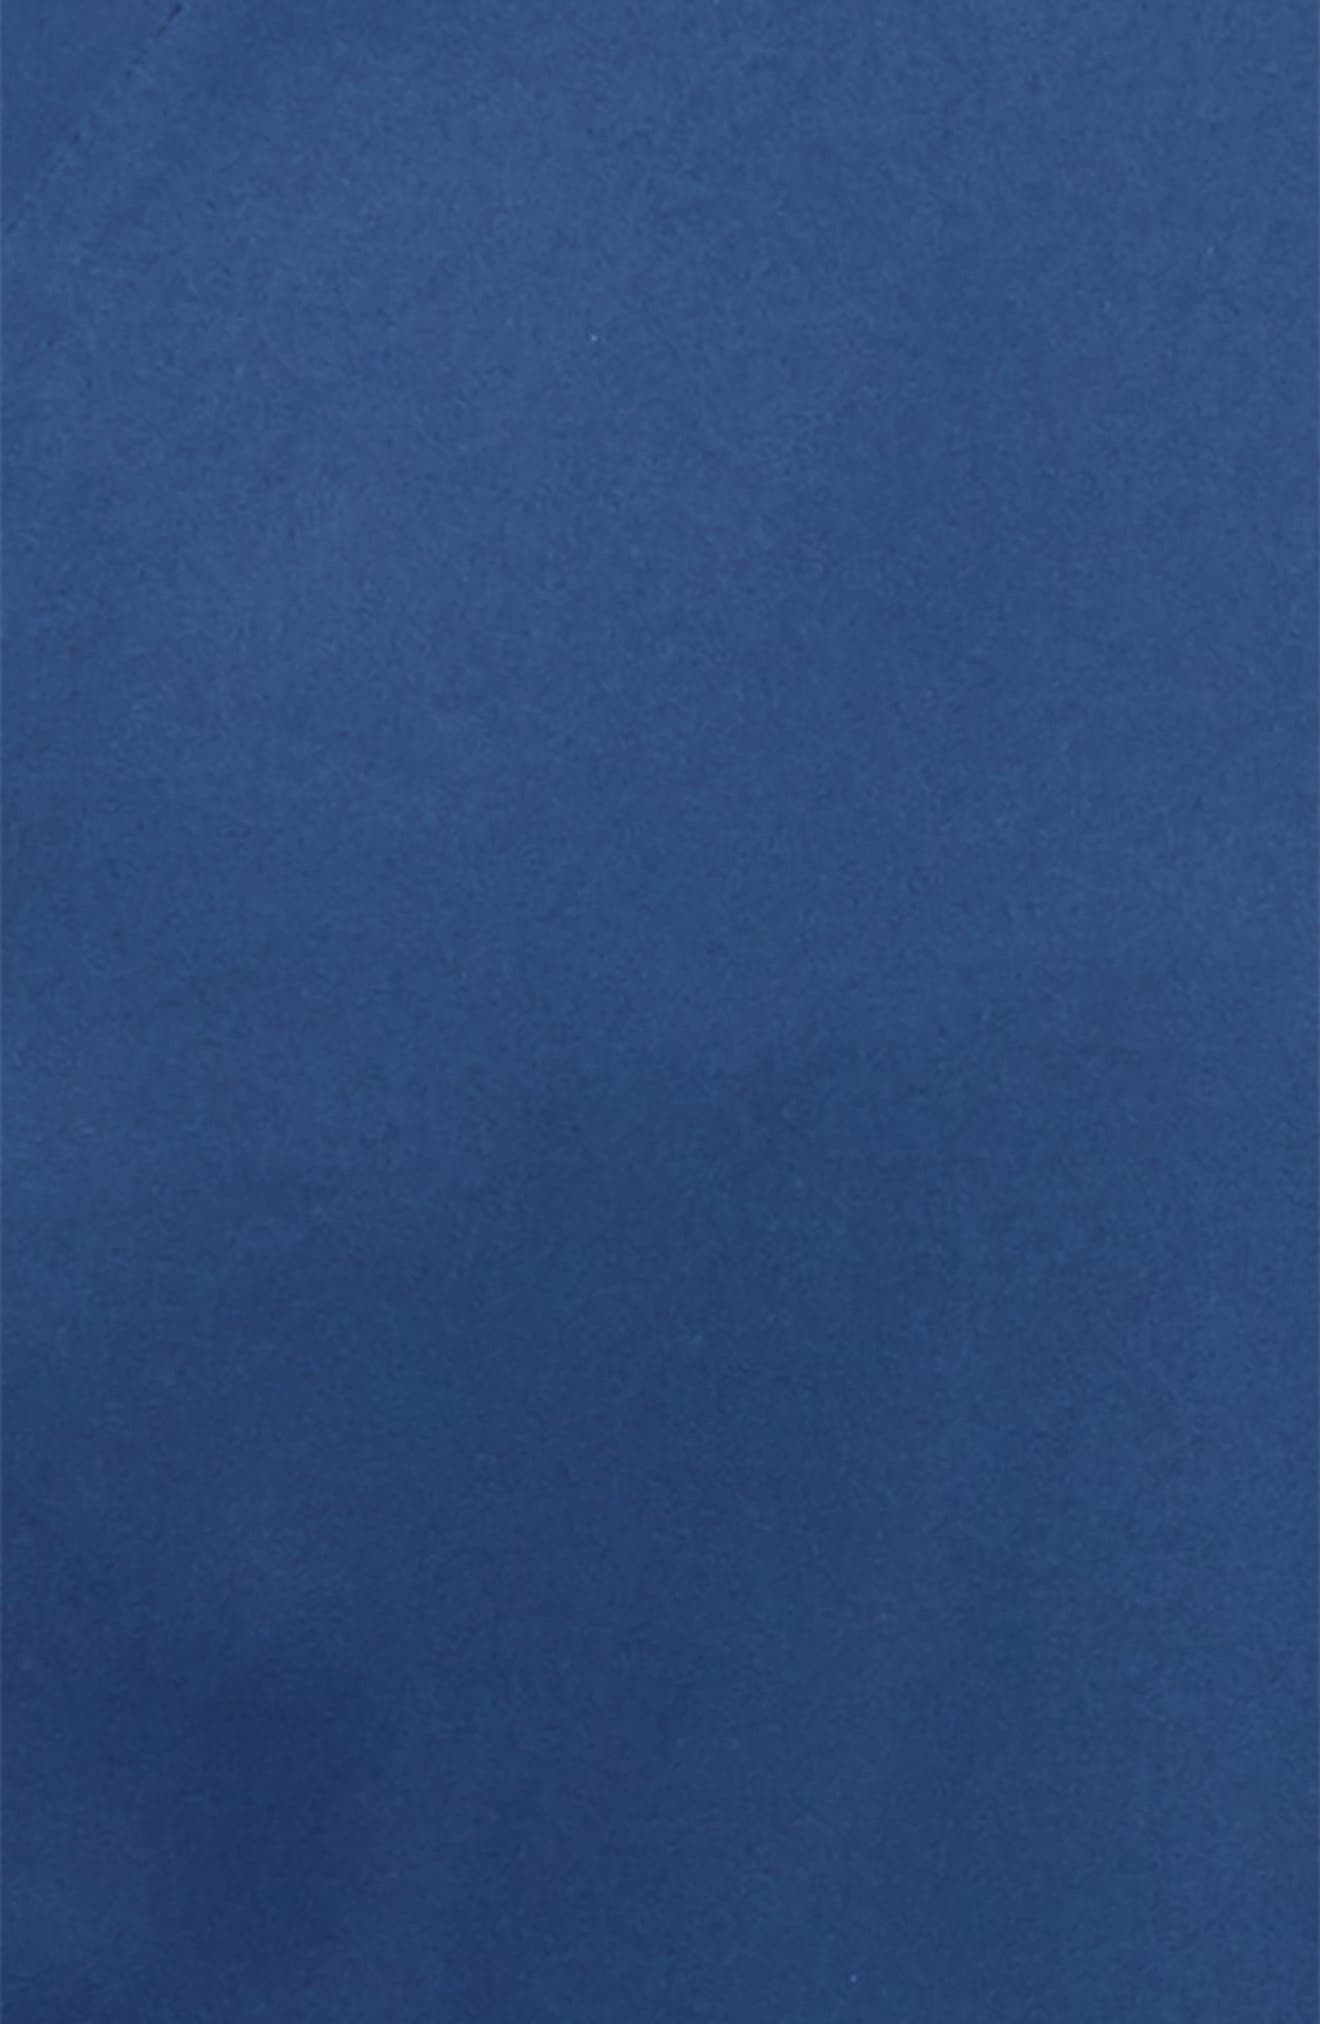 Water Resistant Varsity Jacket,                             Alternate thumbnail 2, color,                             Uniform Blue